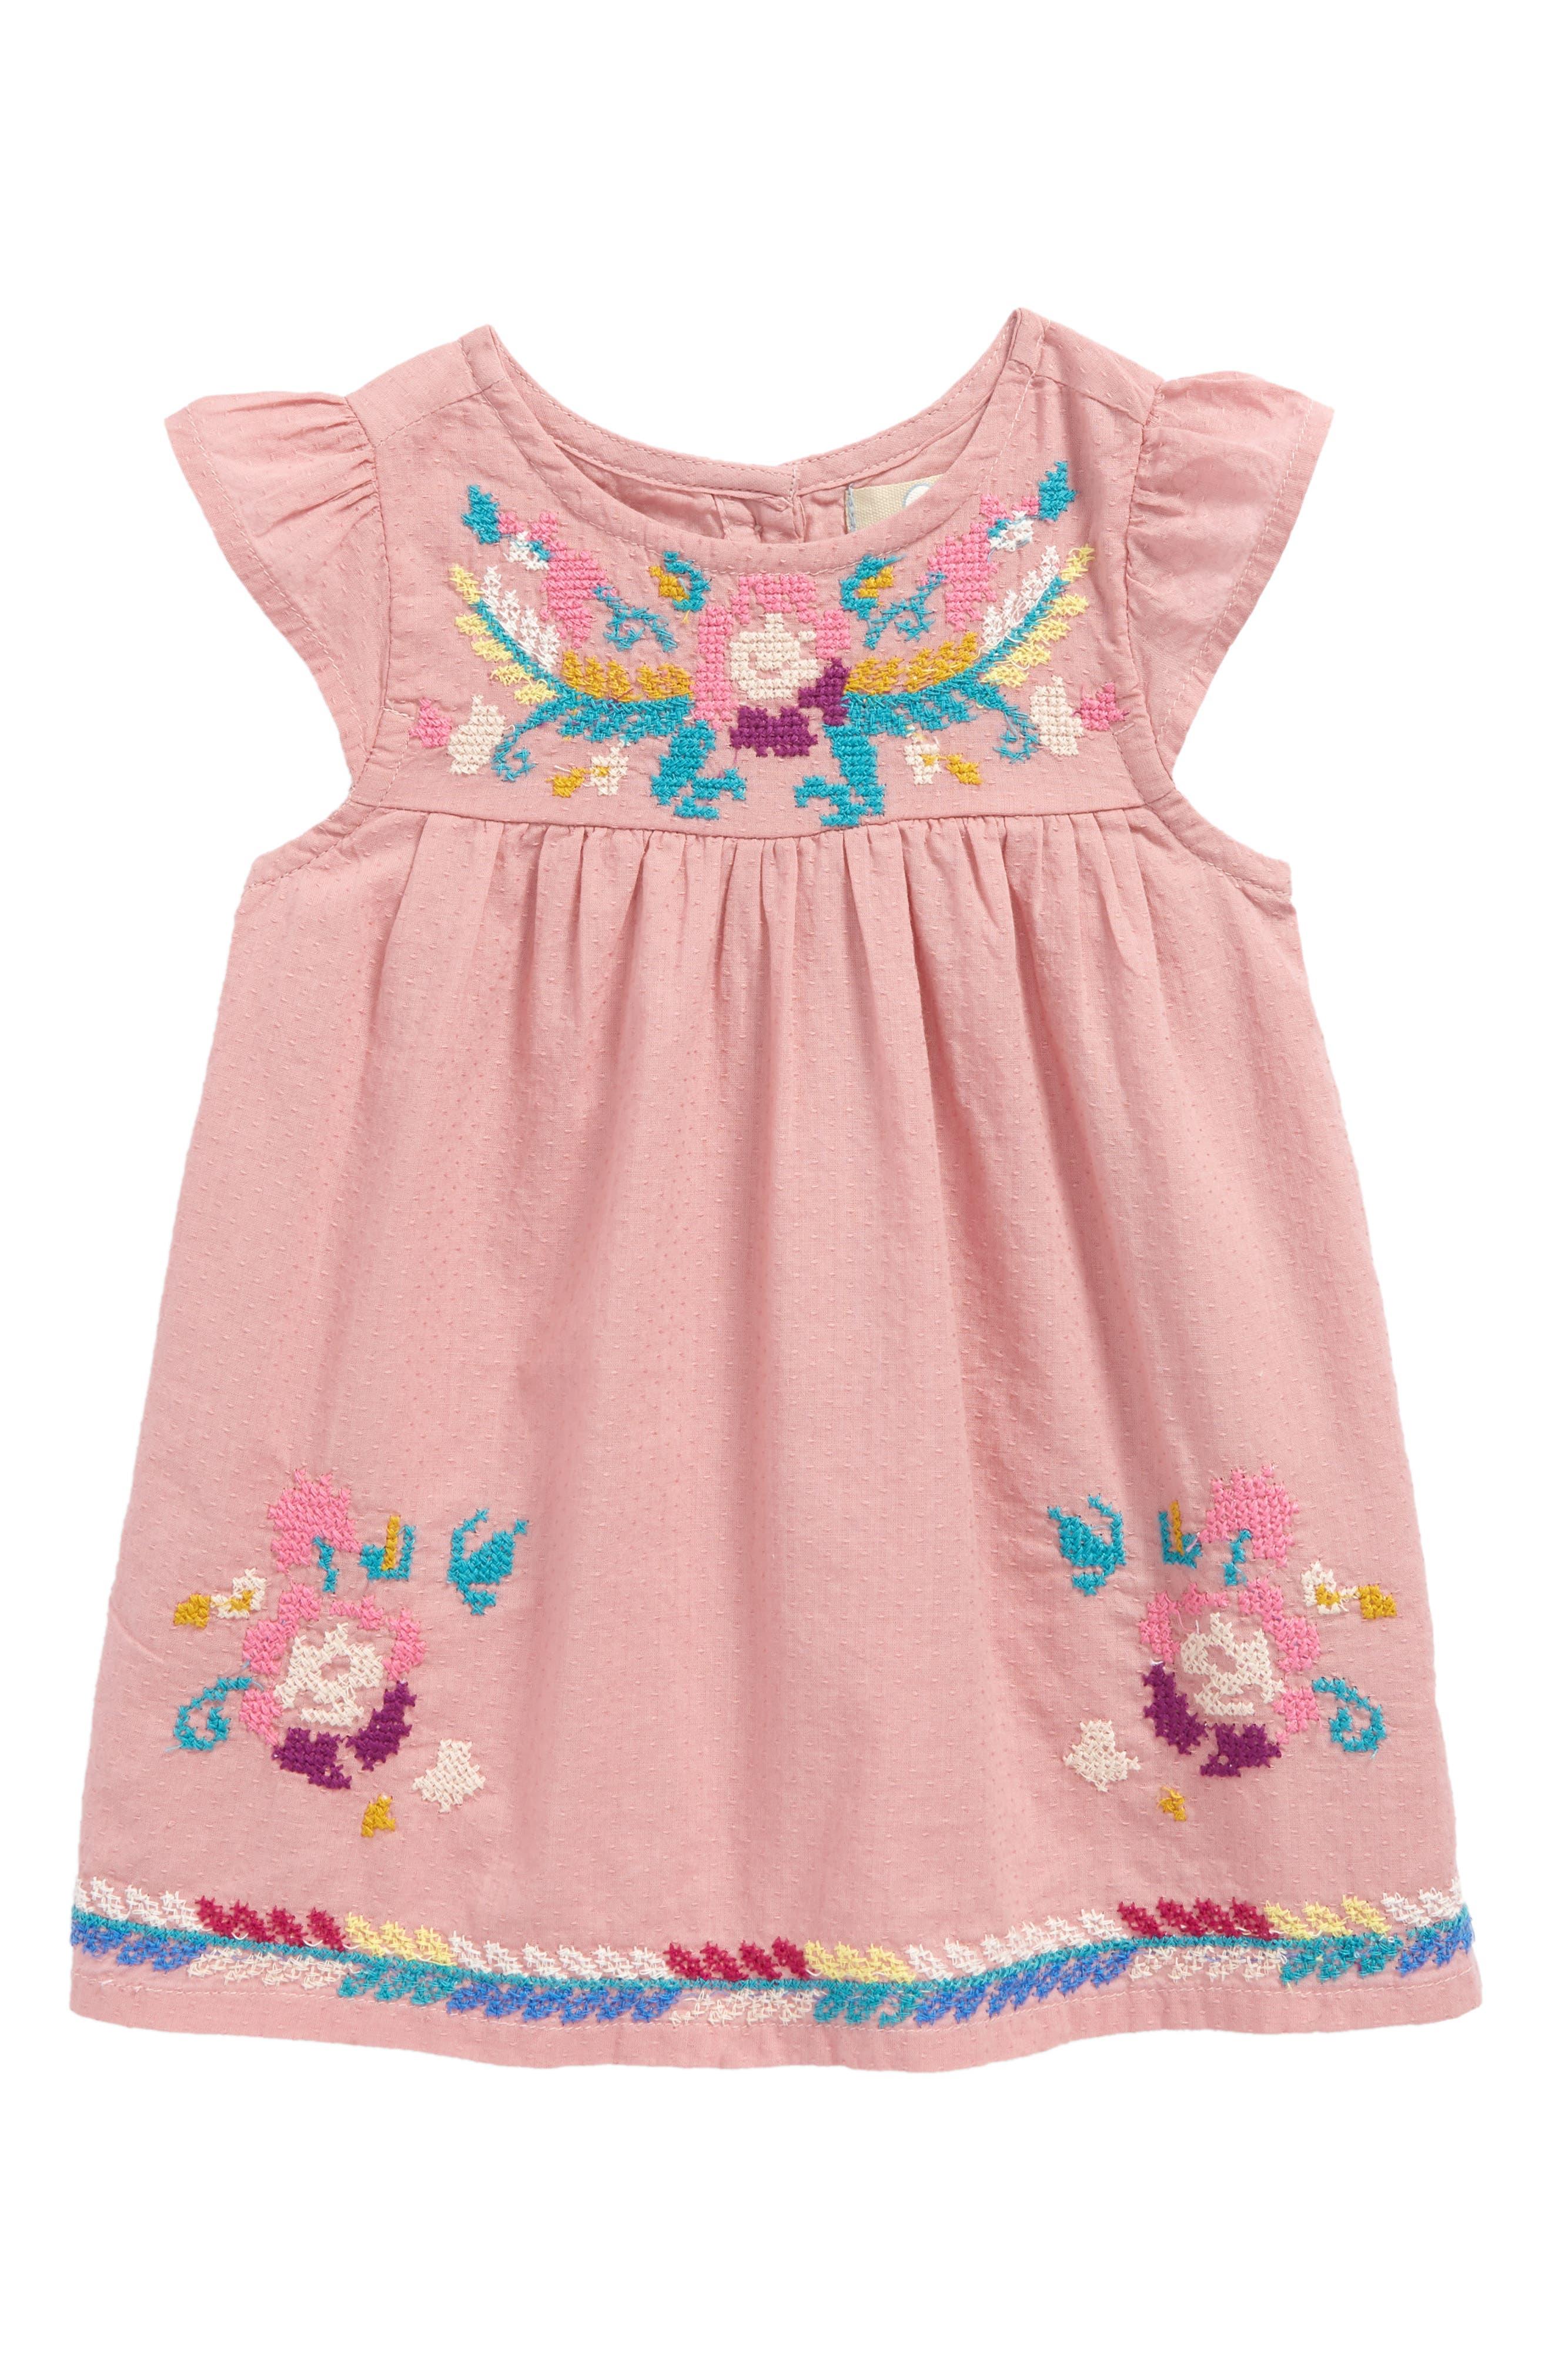 Peek Delilah Embroidered Dress (Baby Girls)